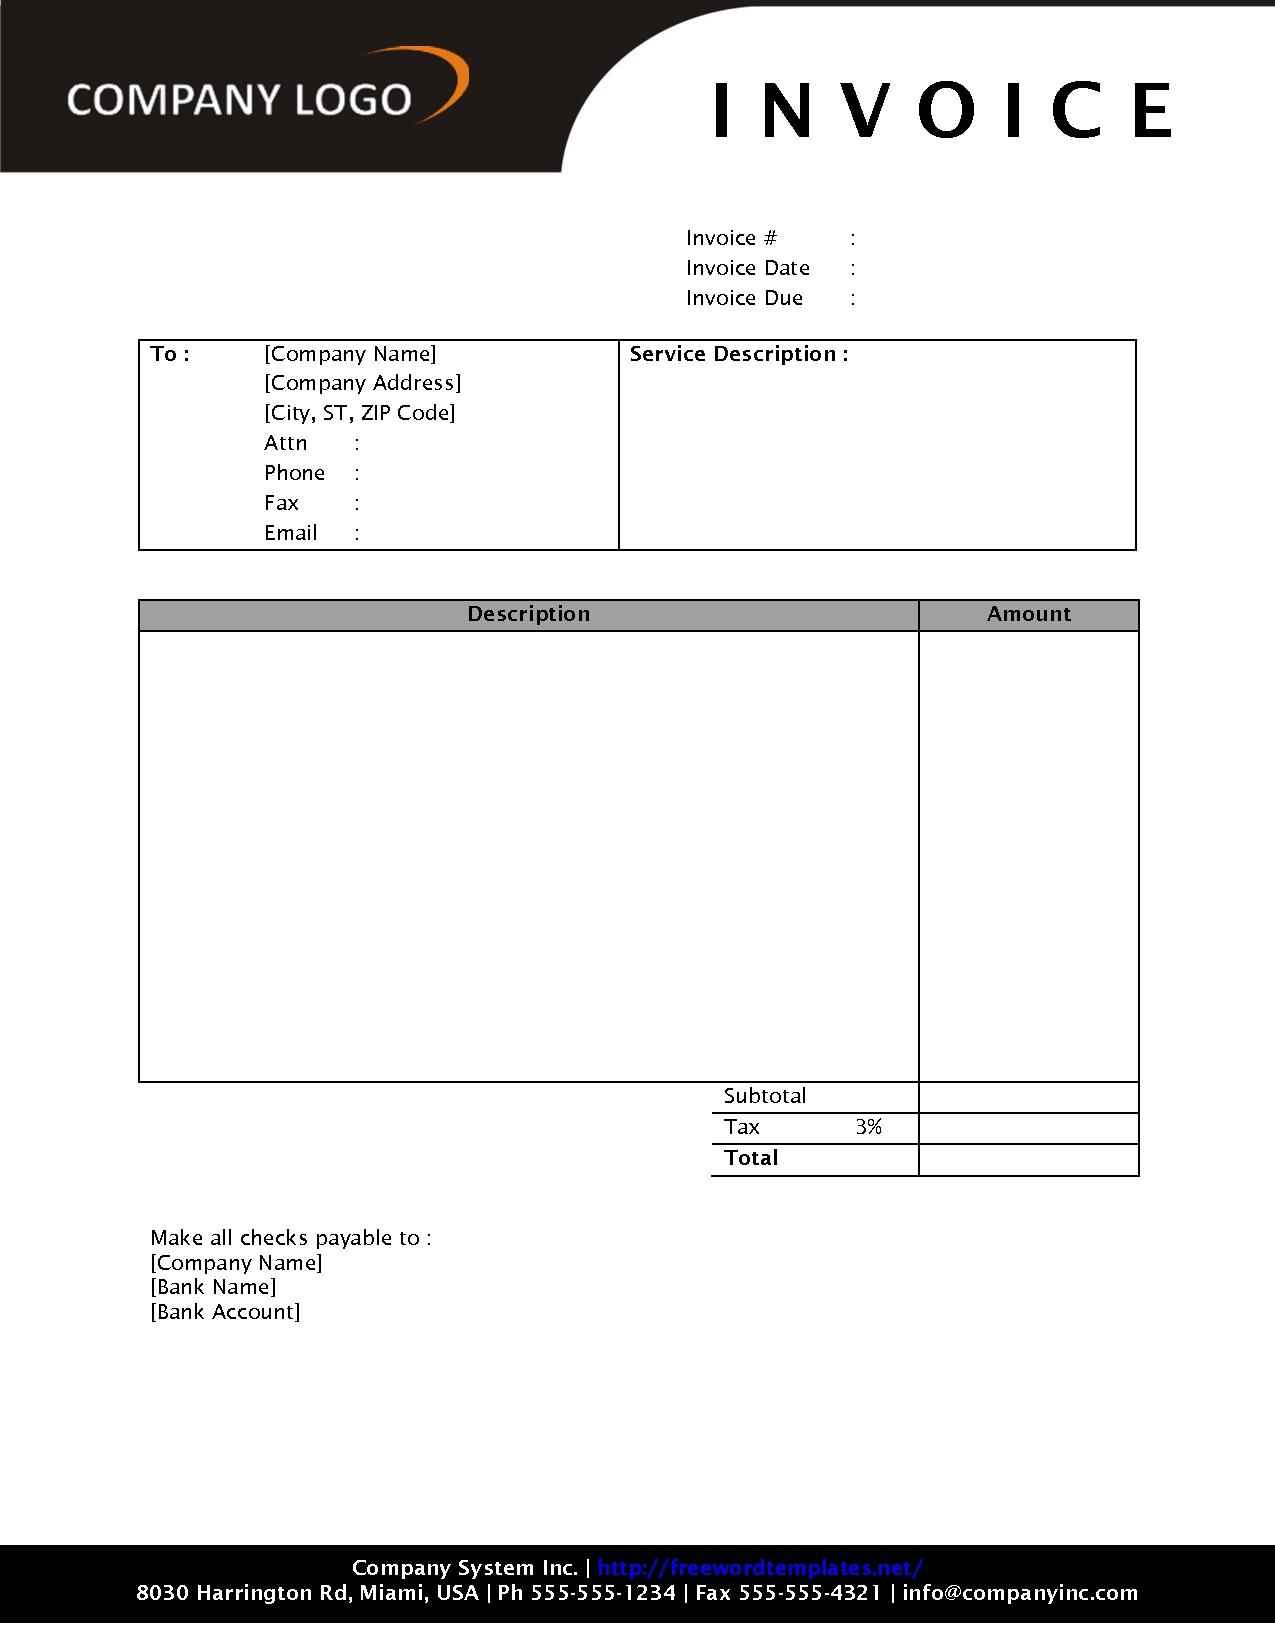 download invoice template download invoice template best template design 1275 X 1650